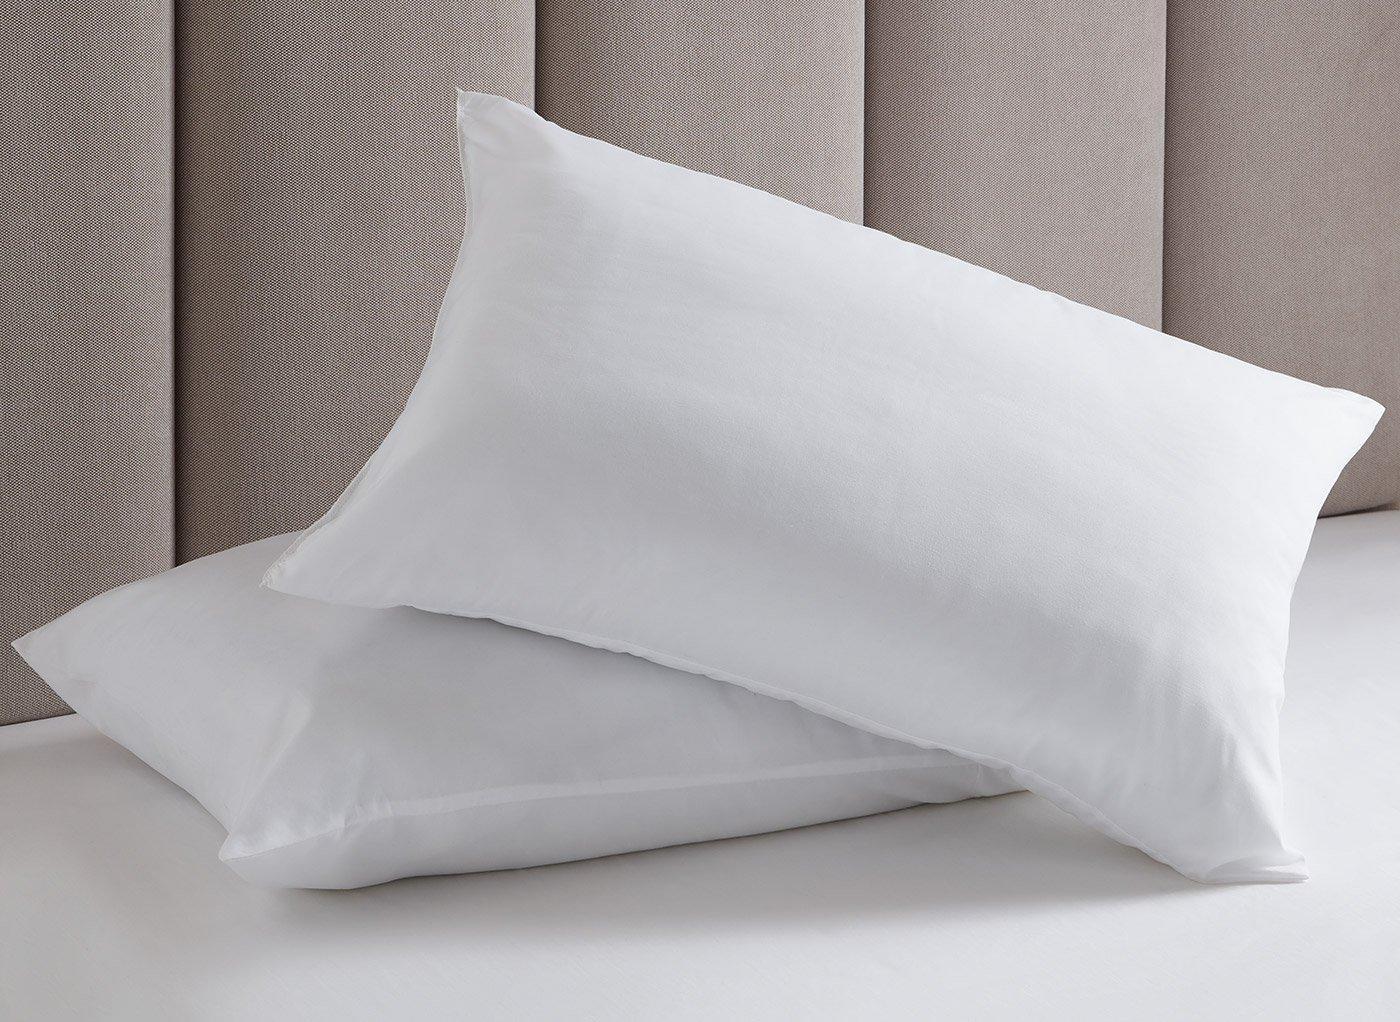 Doze Super Soft Pillow Pair